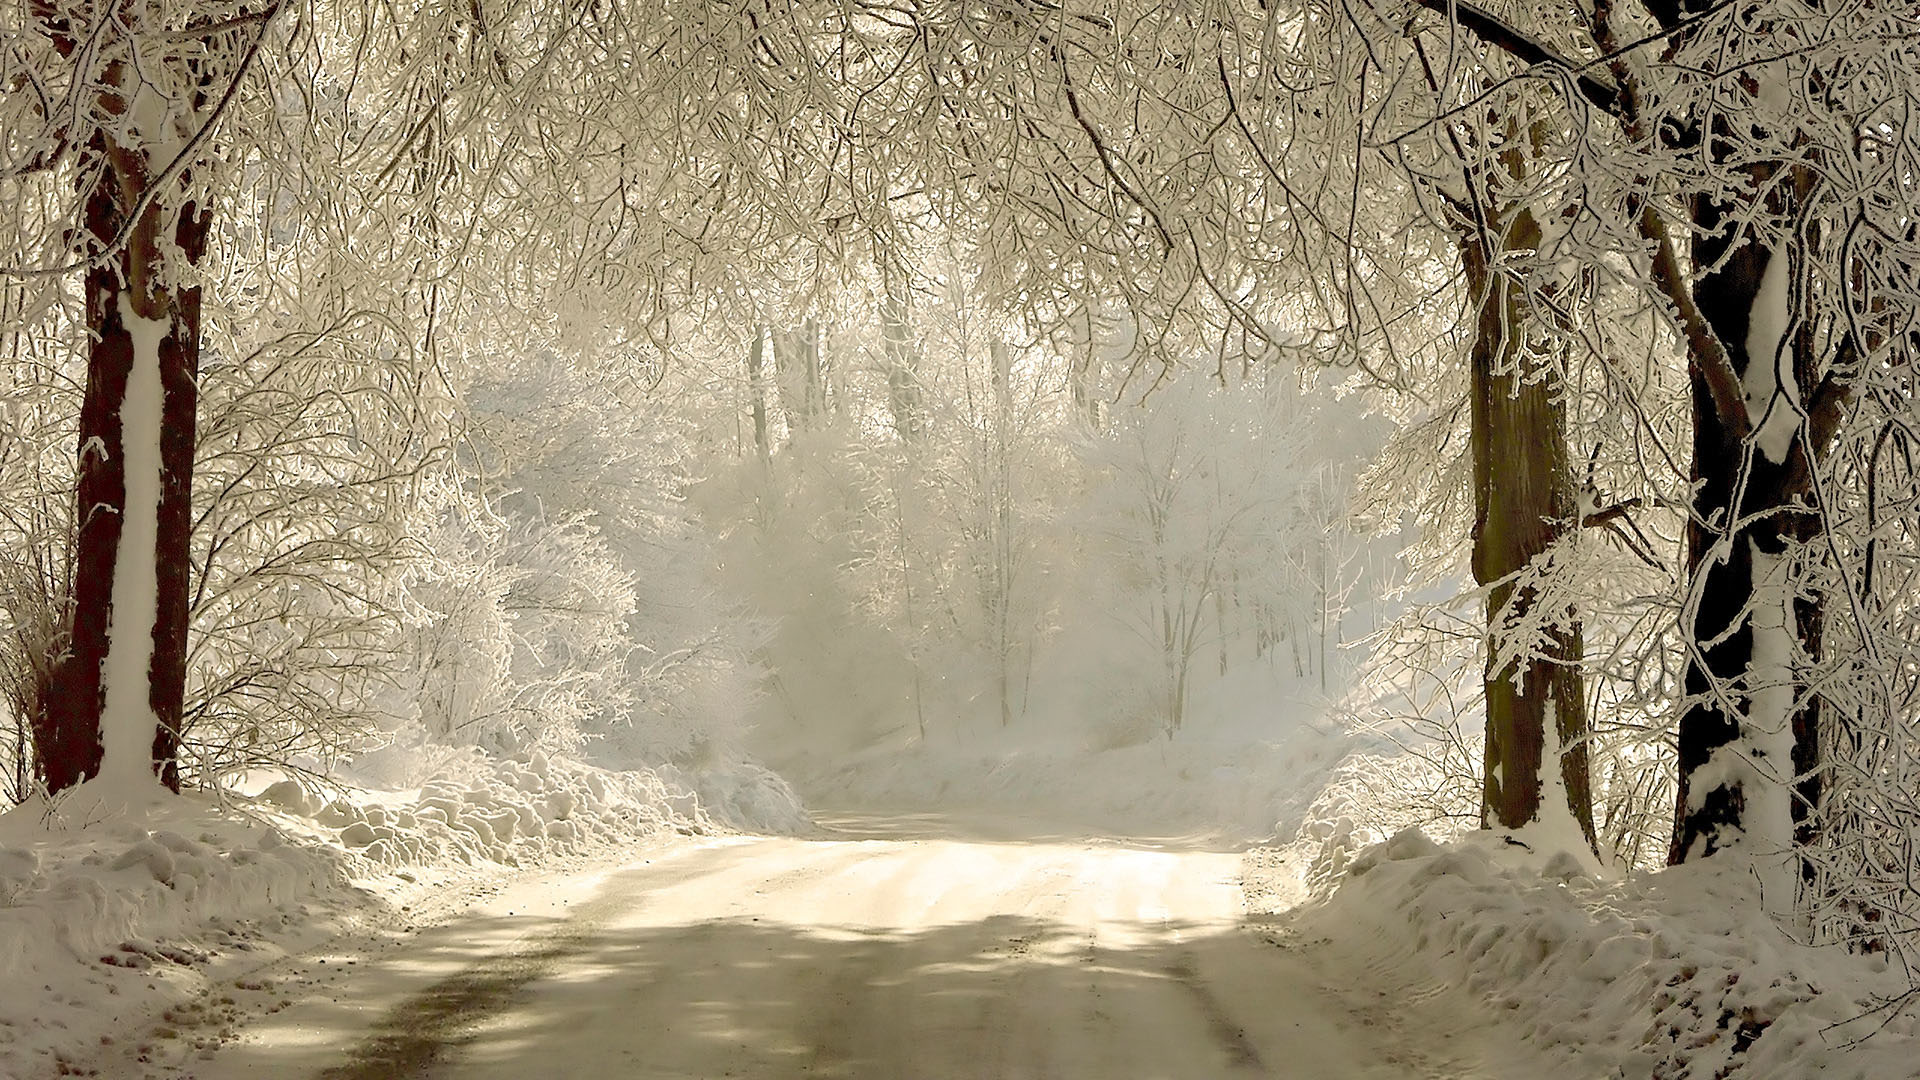 1920x1080 Snowy forest road desktop PC and Mac wallpaper 1920x1080